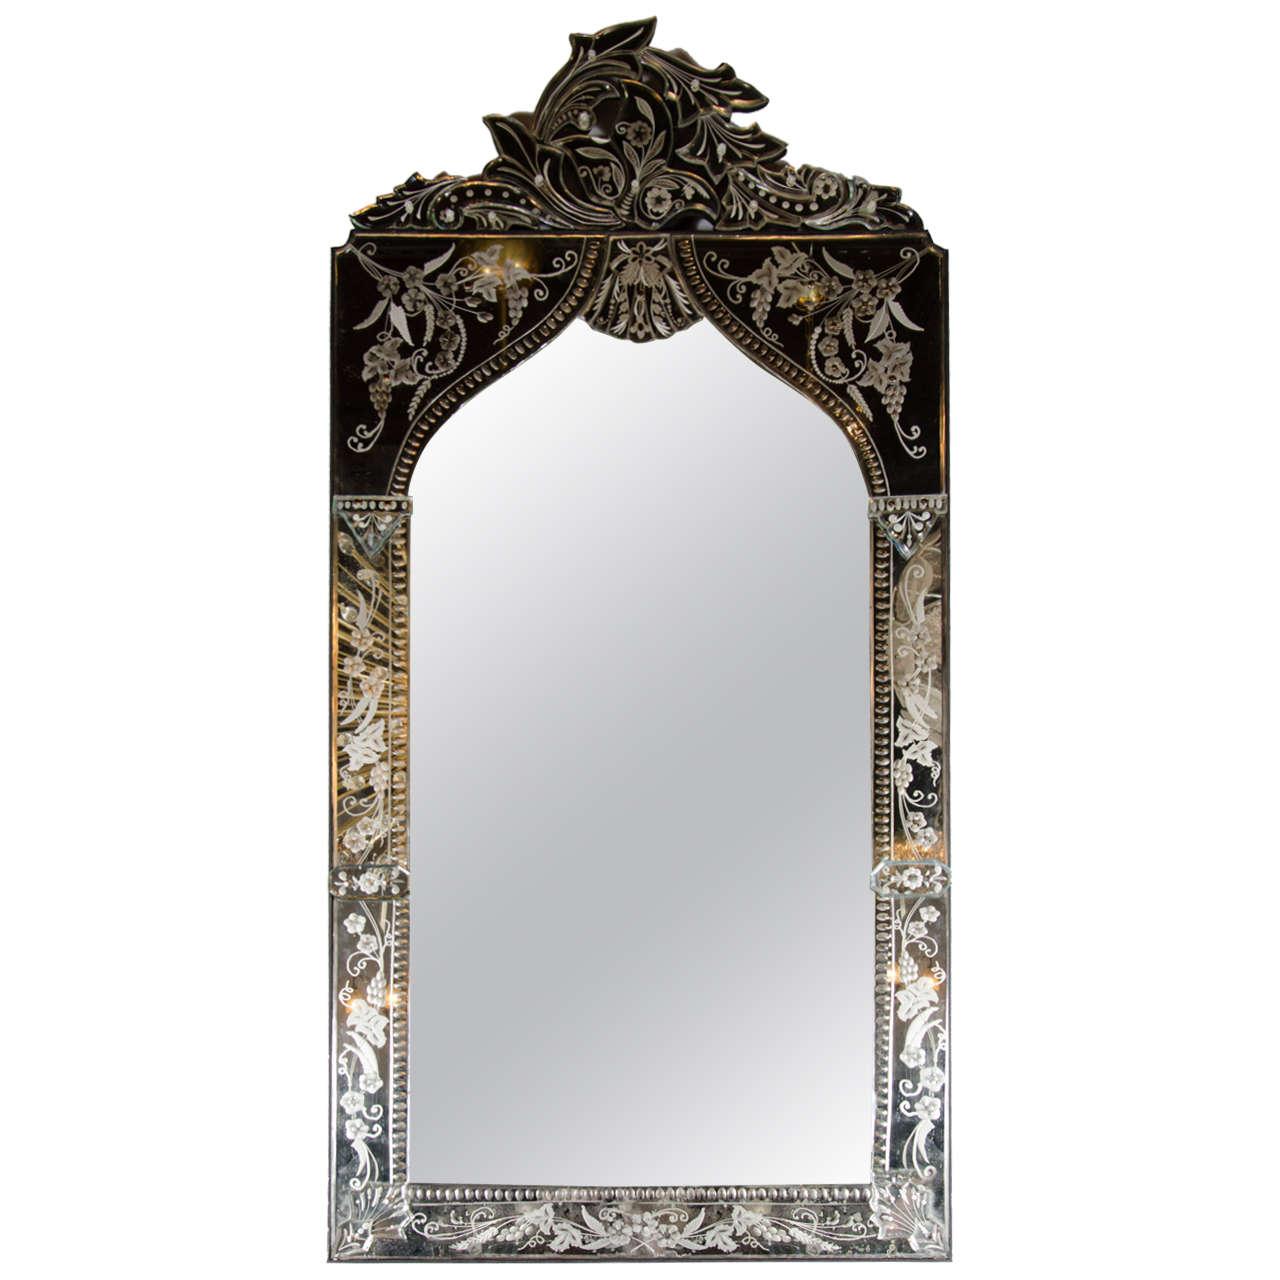 Exquisite Venetian Arabesque Style Mirror with Reverse Etching